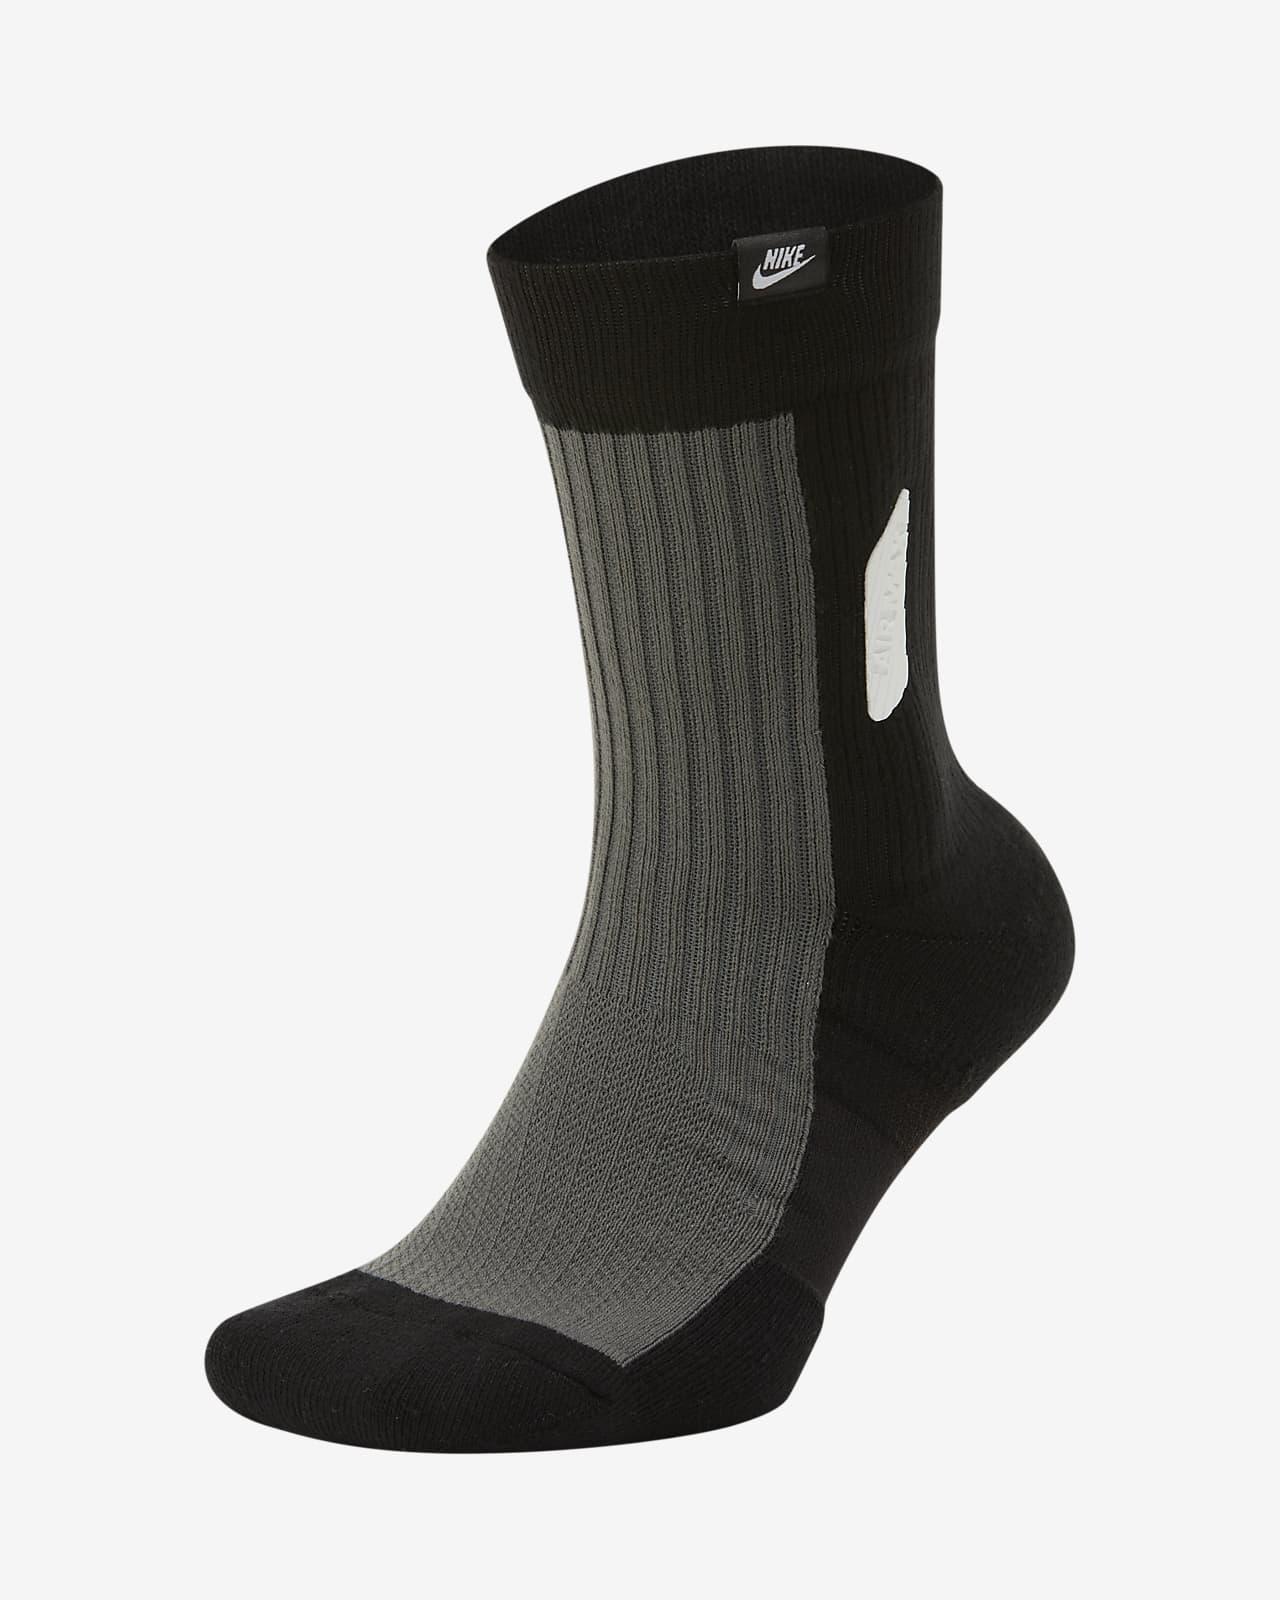 Nike SNEAKR Sox Air Max 90 Crew Socks